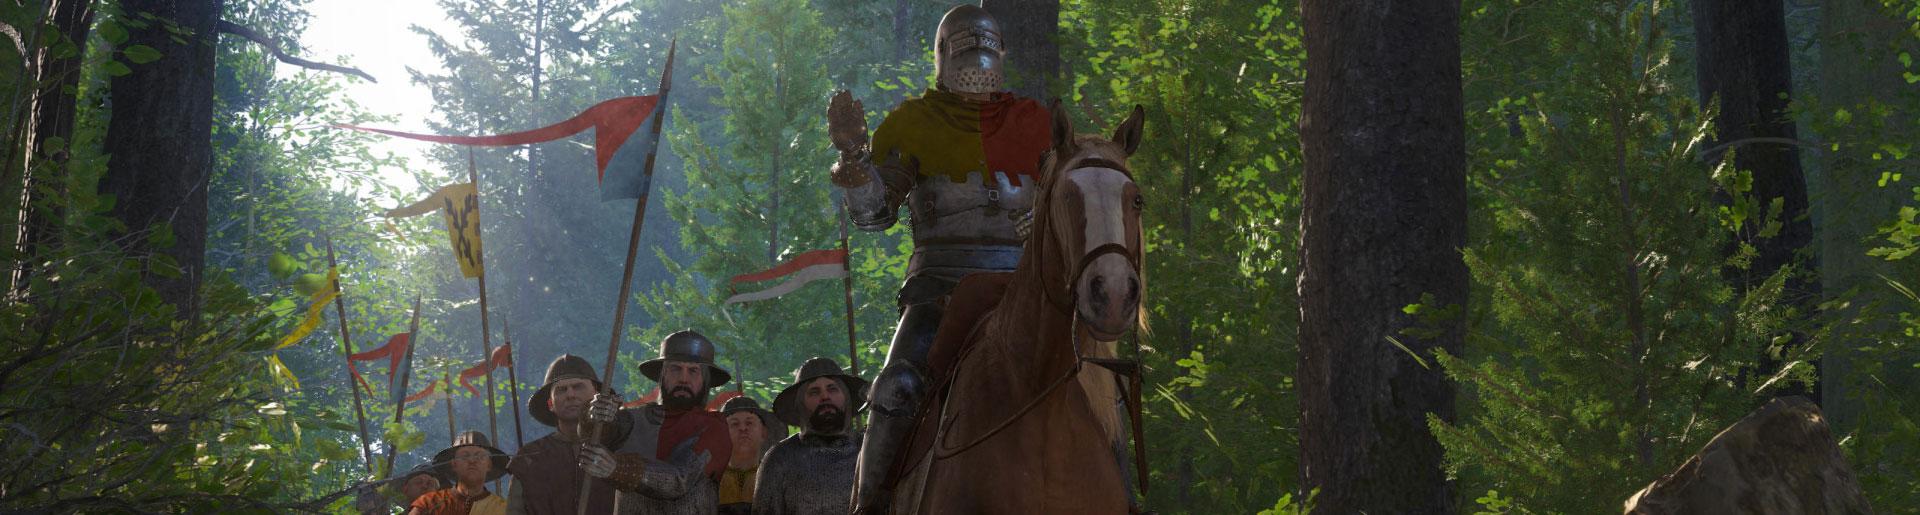 Realizing Medieval Bohemia in Kingdom Come: Deliverance